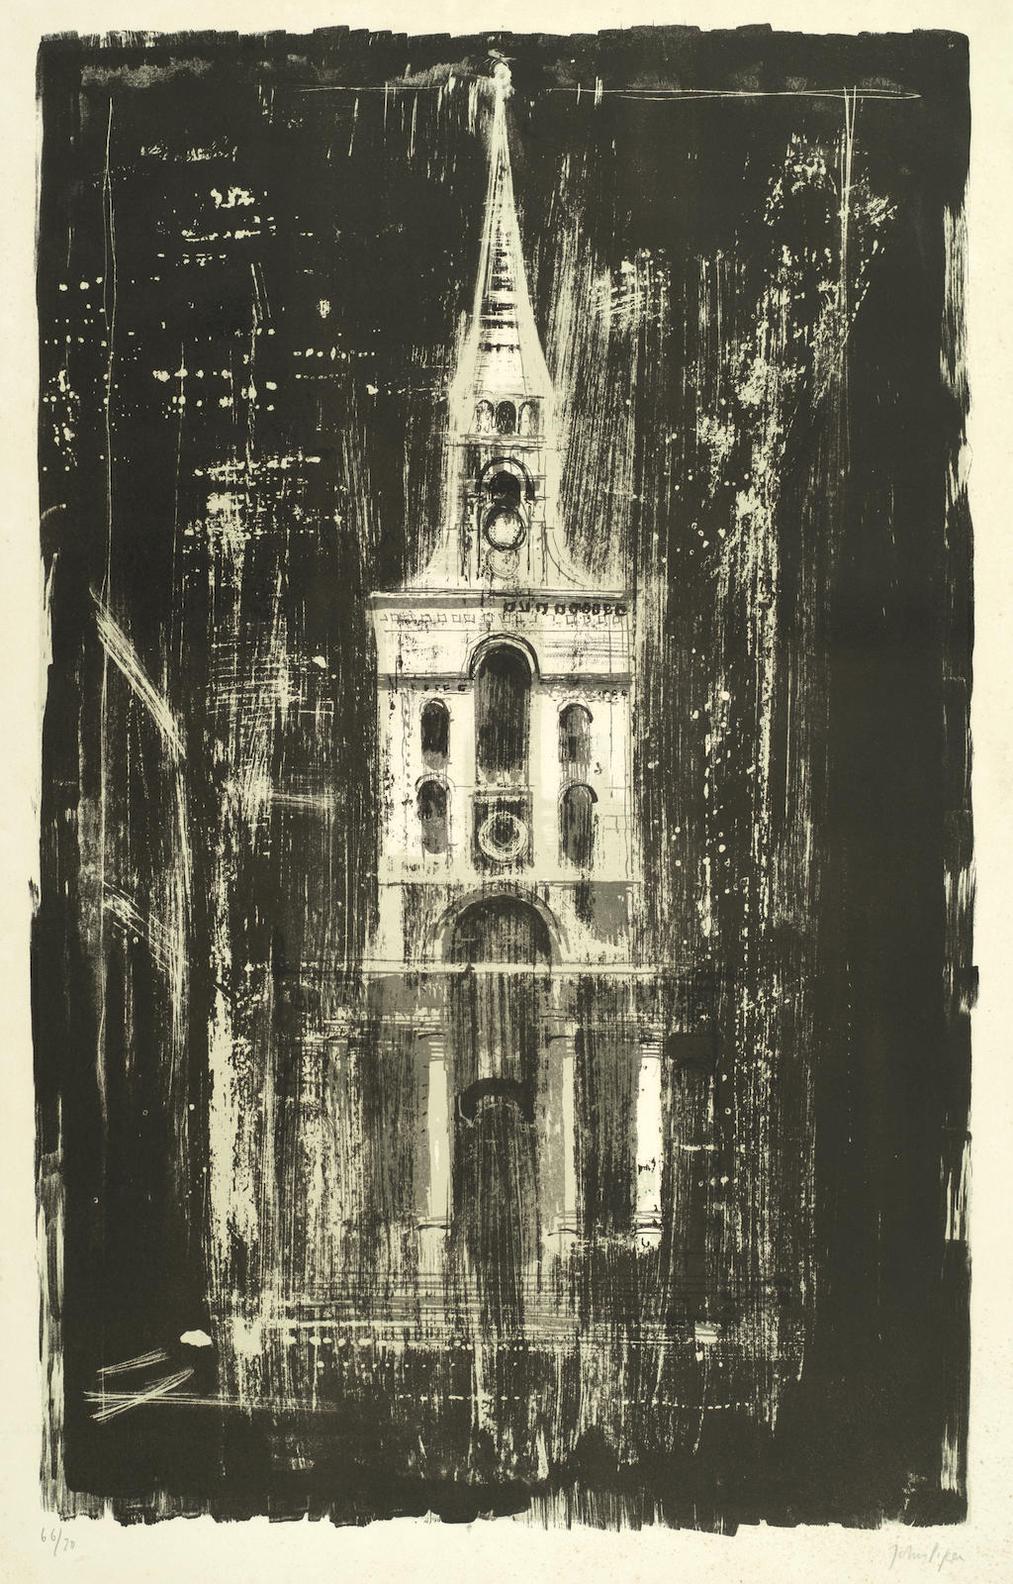 John Piper-Christ Church, Spitafields, London, By Nicholas Hawksmoor, From A Retrospect Of Churches (Levinson 142)-1964